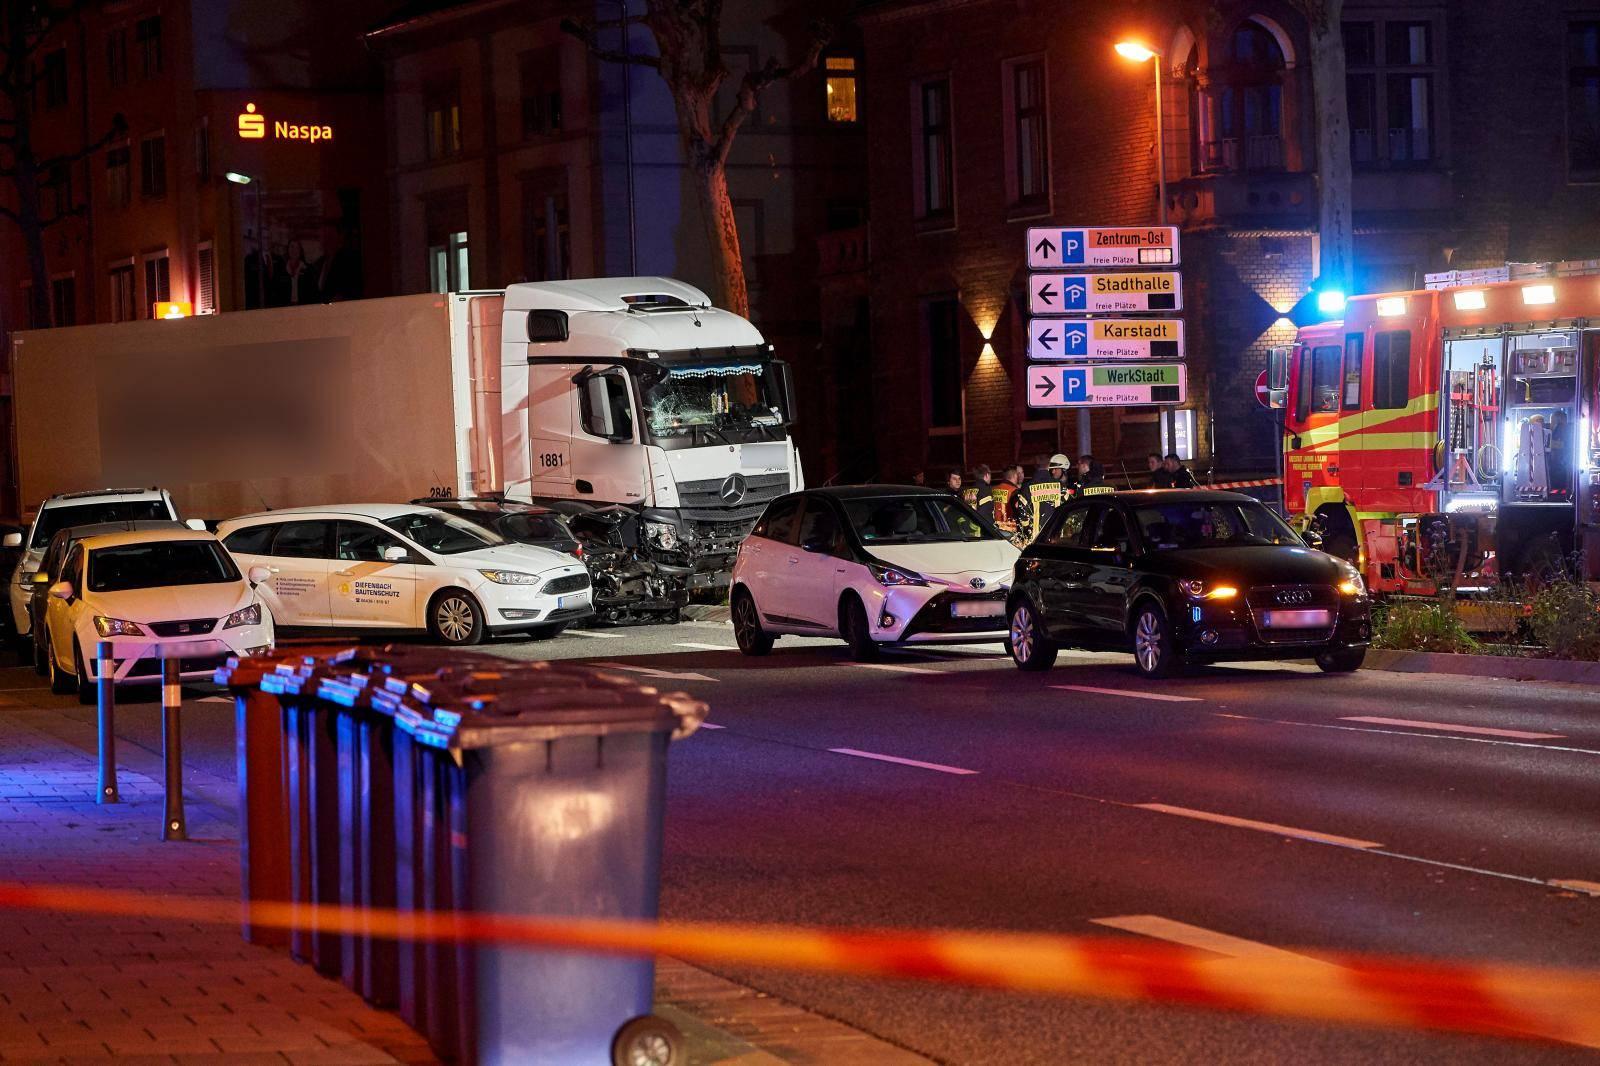 Truck hits vehicles - A seriously injured man